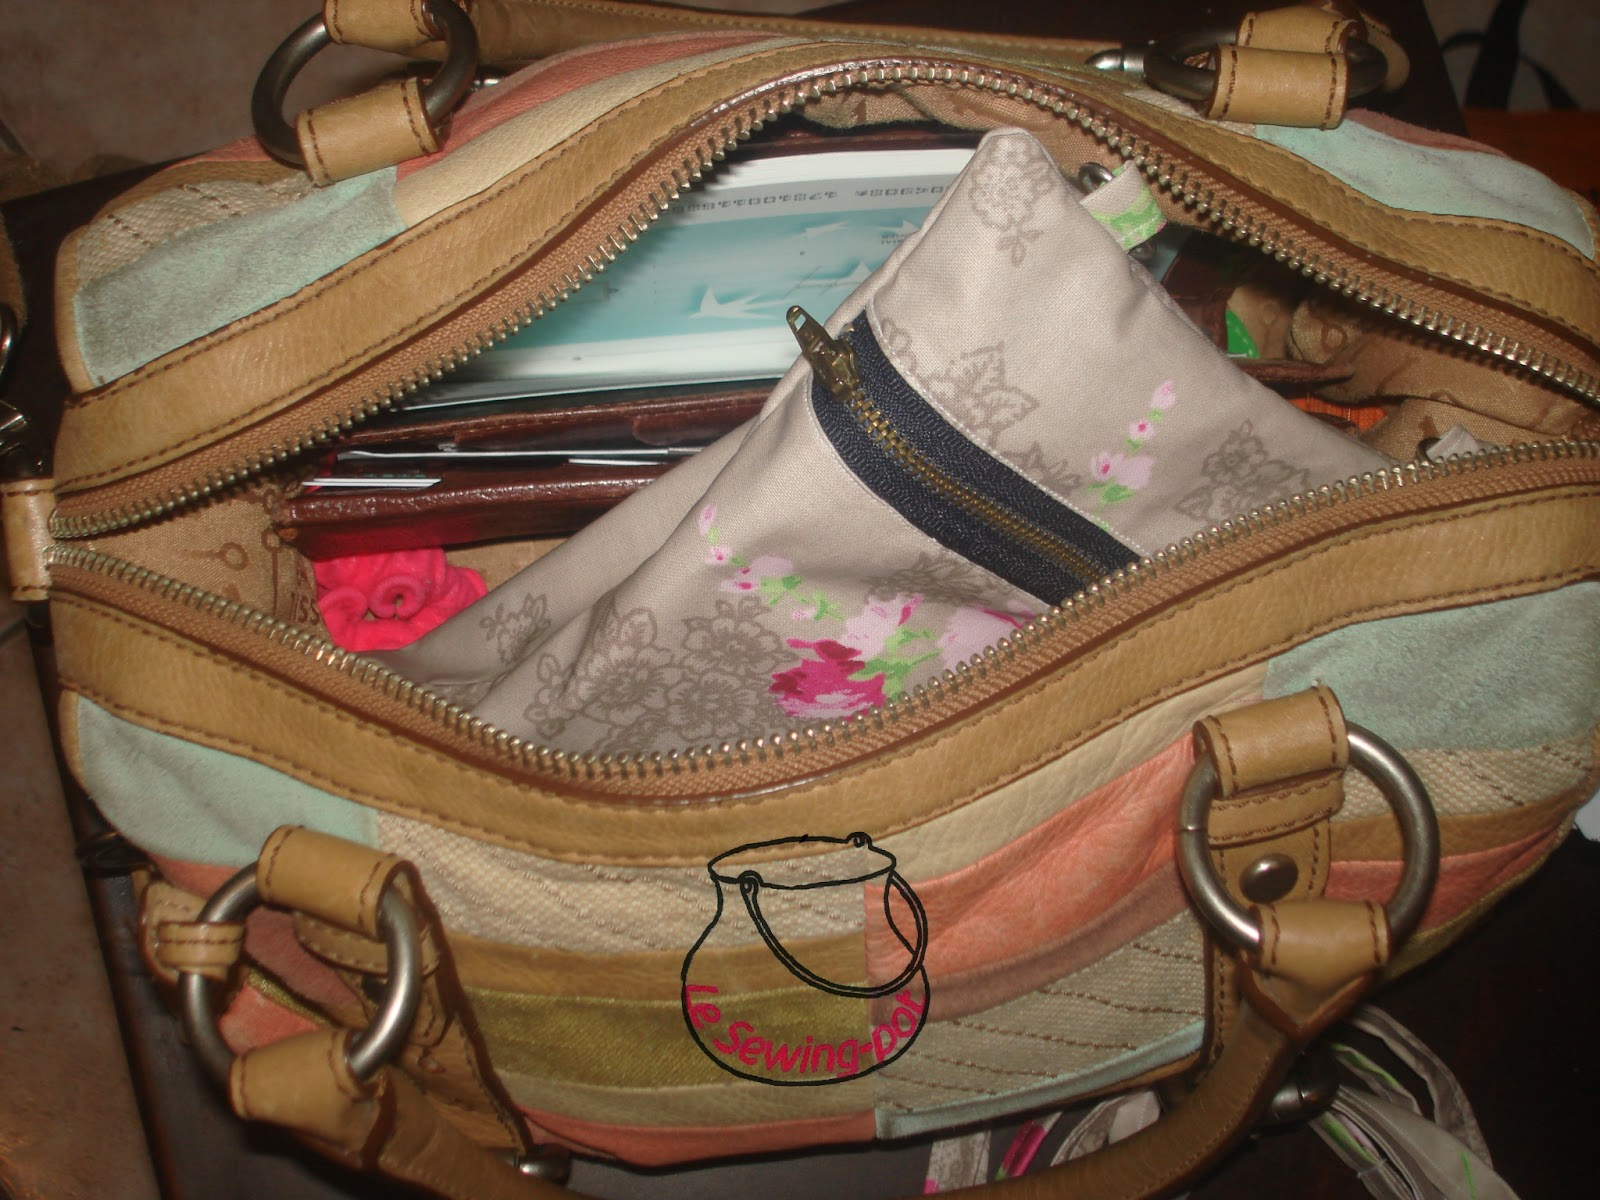 pochette à glisser dans un sac